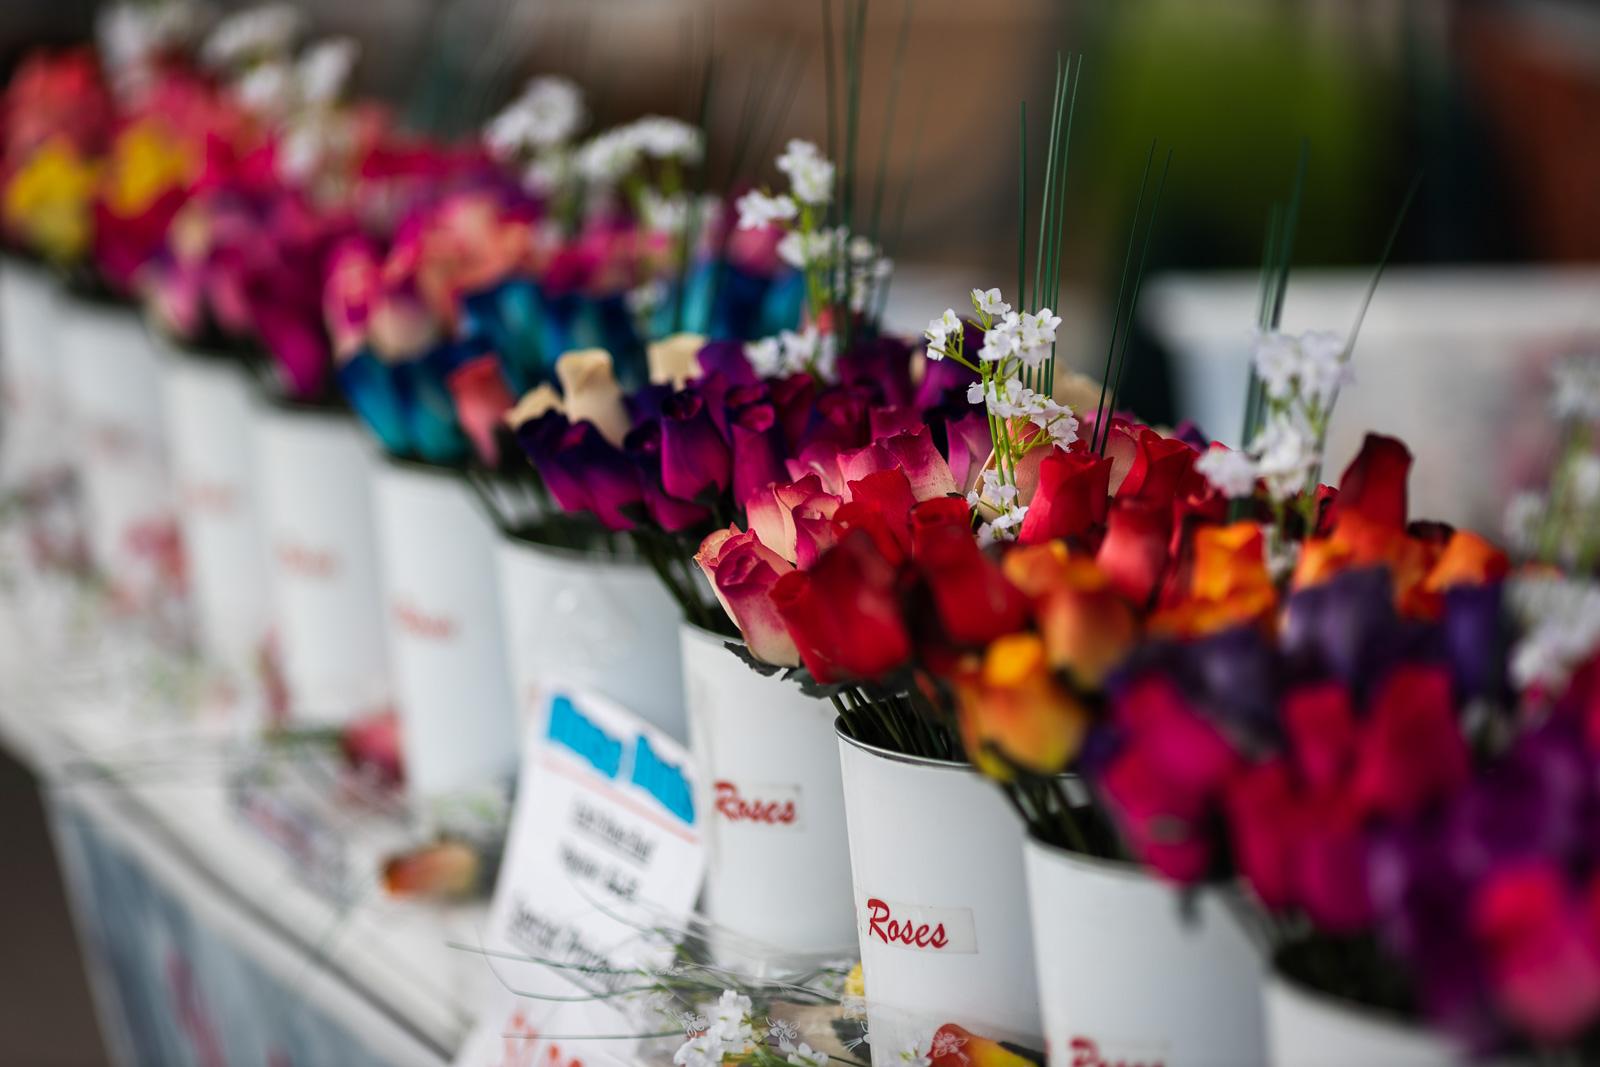 7th-annual-buskers-festival-blog-53.jpg